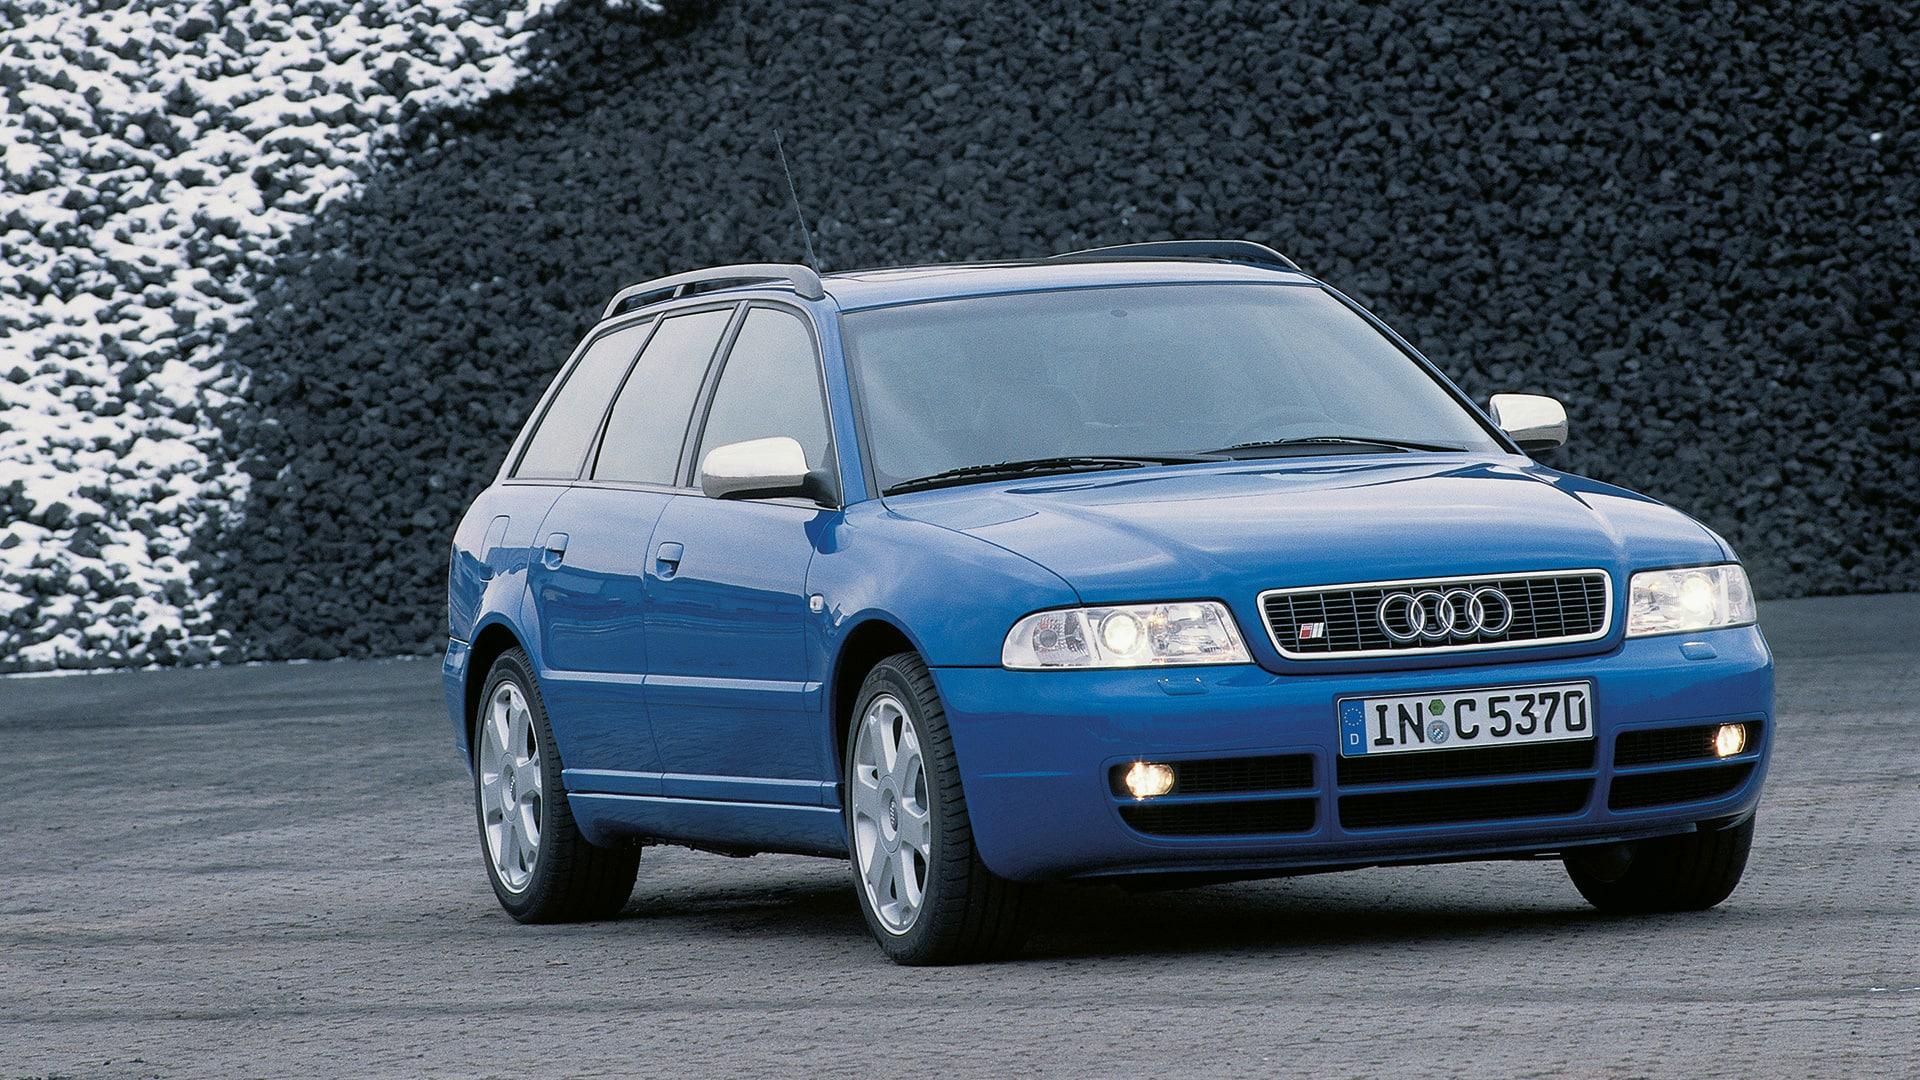 Audi S4 Technische Daten 2003 audi a t vwvortex fs ft 2003 audi